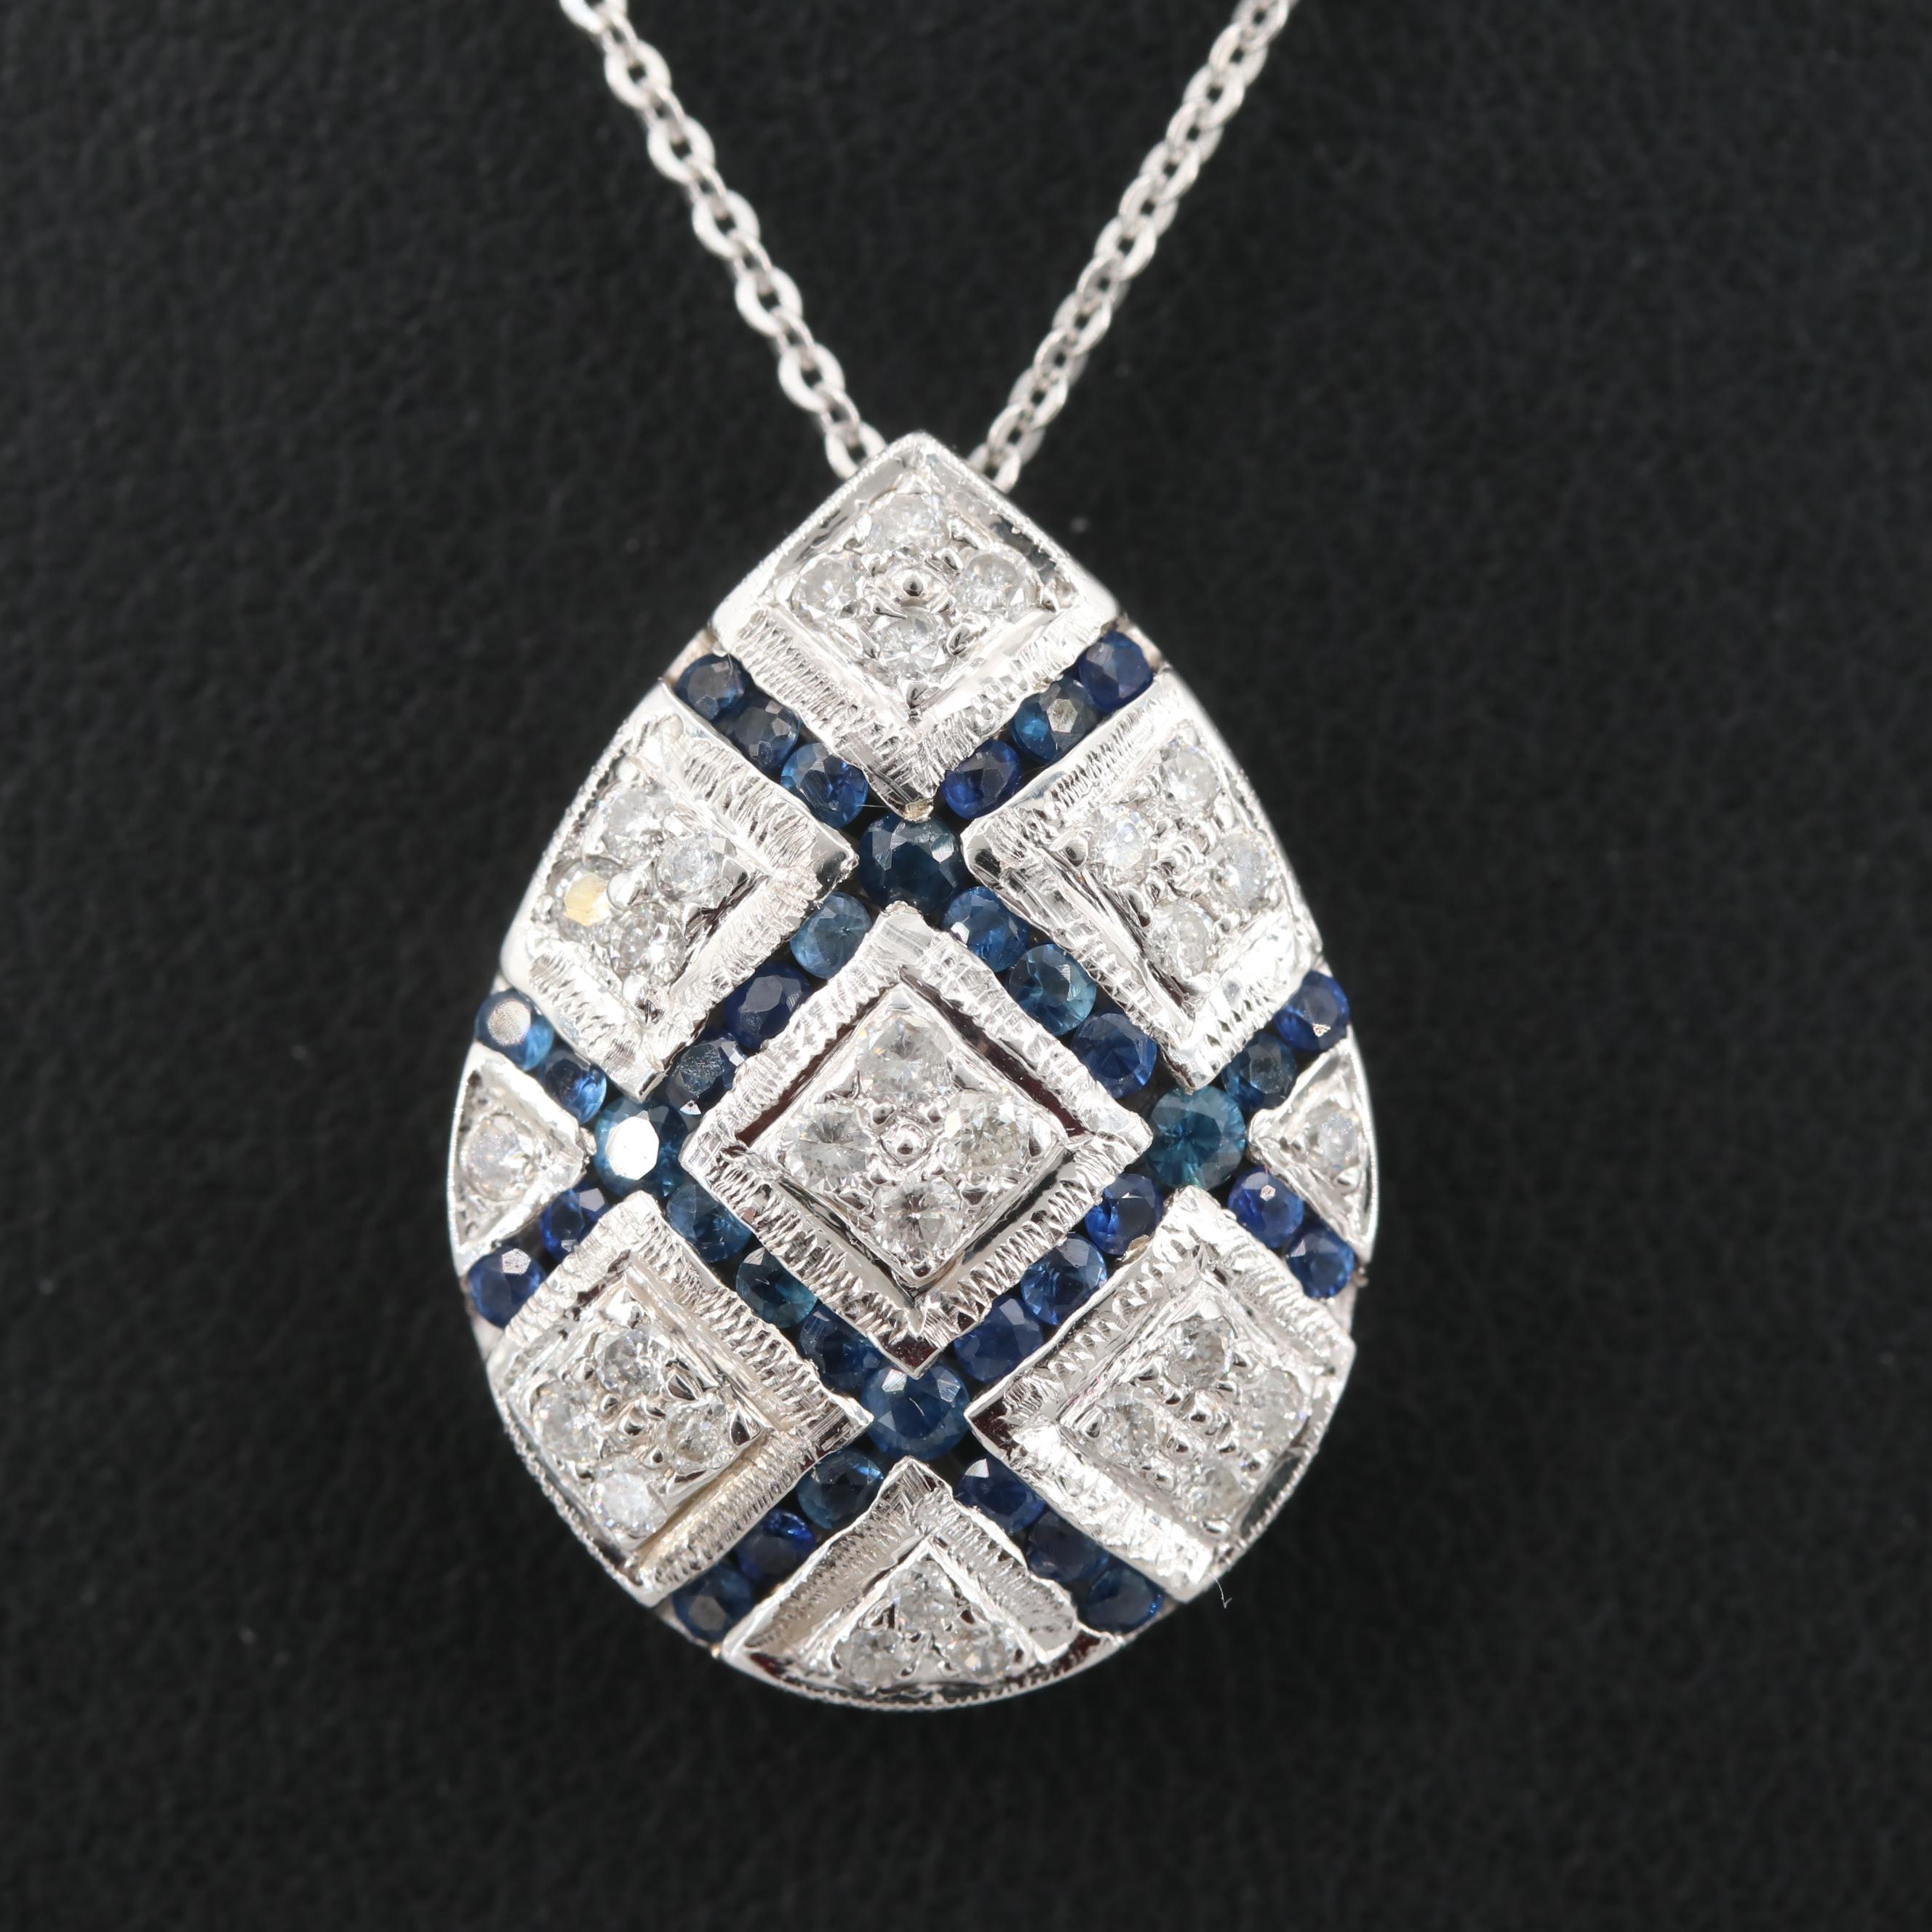 Italian 14K White Gold Diamond and Blue Sapphire Pendant Necklace